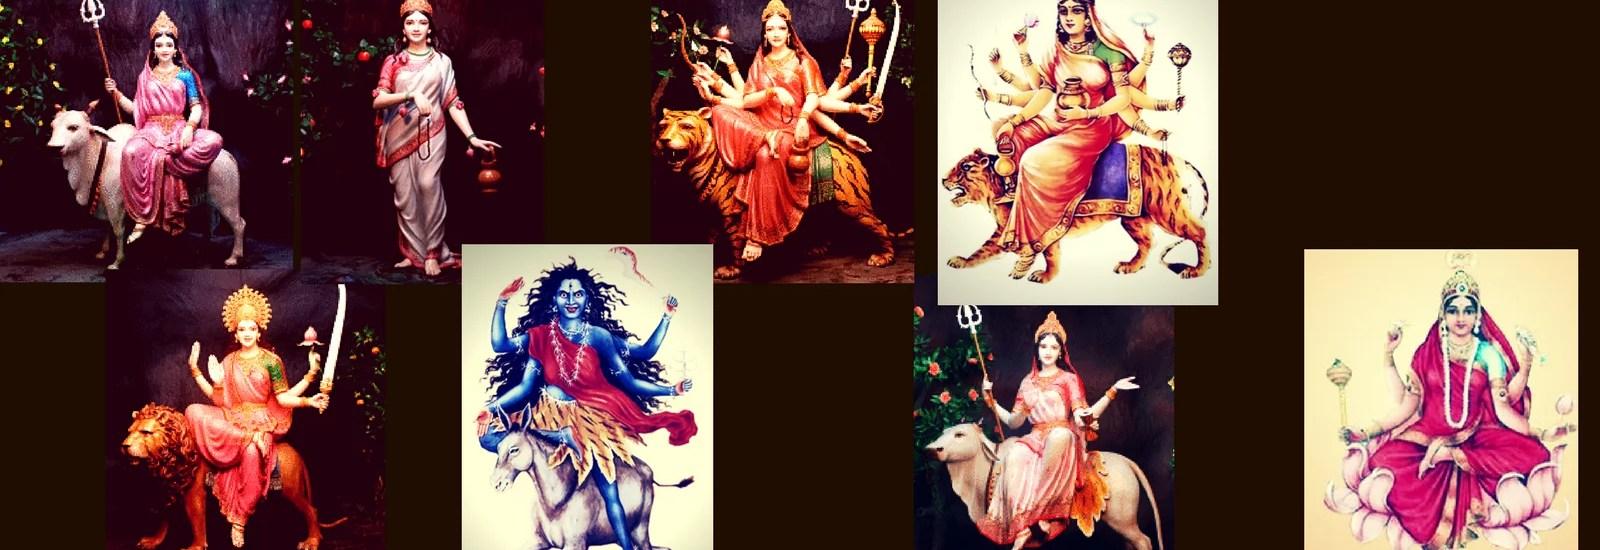 Navdurga: the 9 Forms of Durga